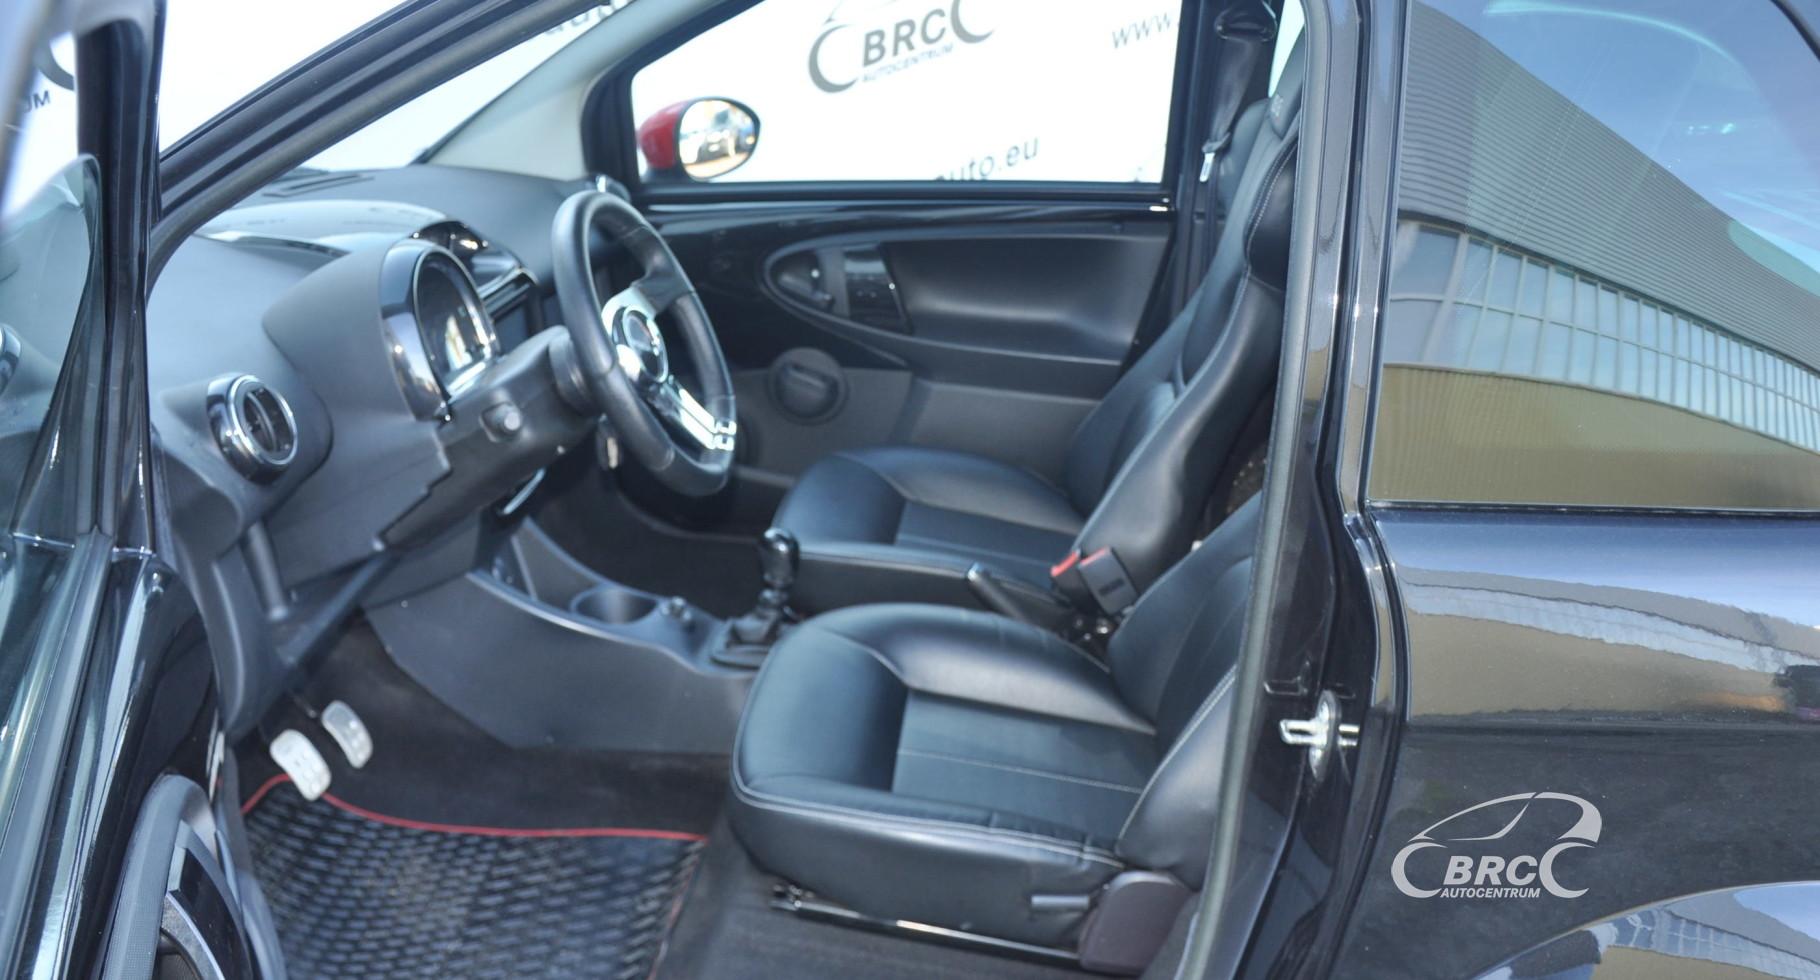 Bellier B8 Microcar